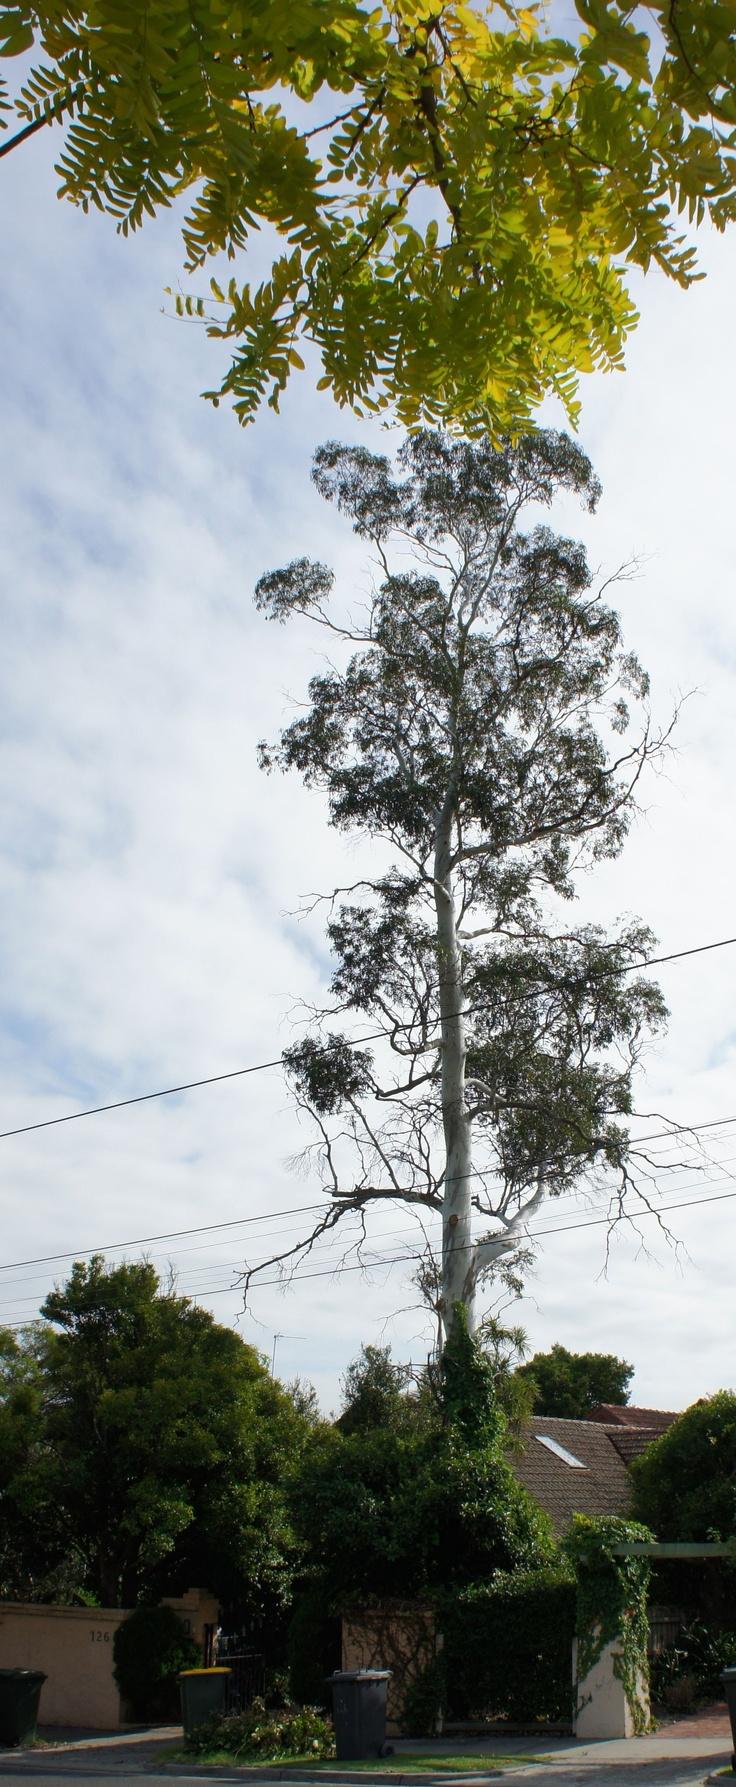 Eucaplyptus in Balaclava Road, North Caulfield. (photo by Victor Perton)